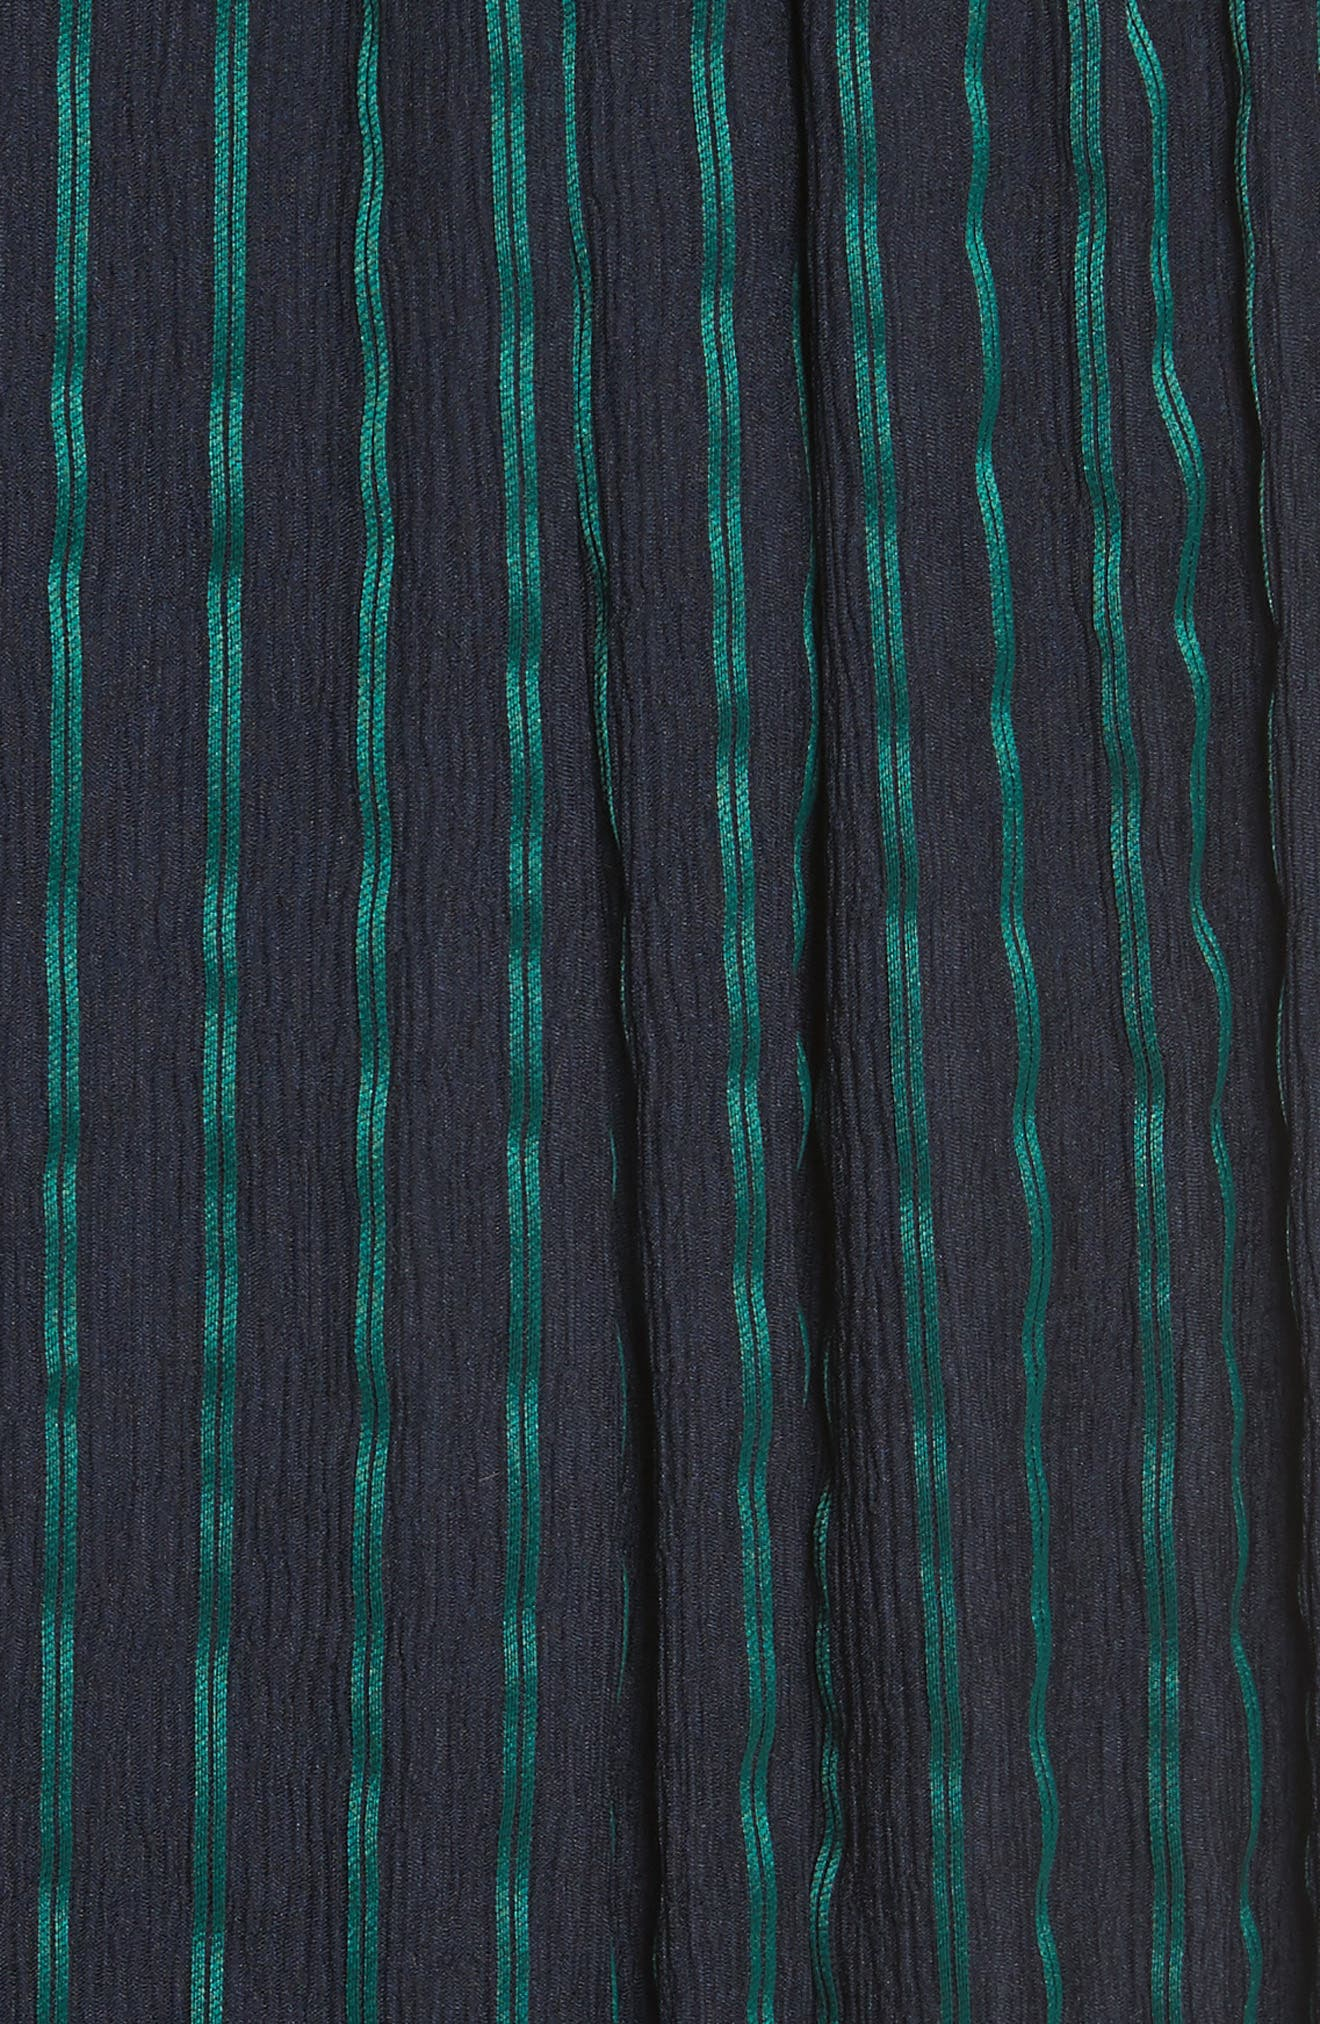 Stripe Chiffon Dress,                             Alternate thumbnail 5, color,                             470